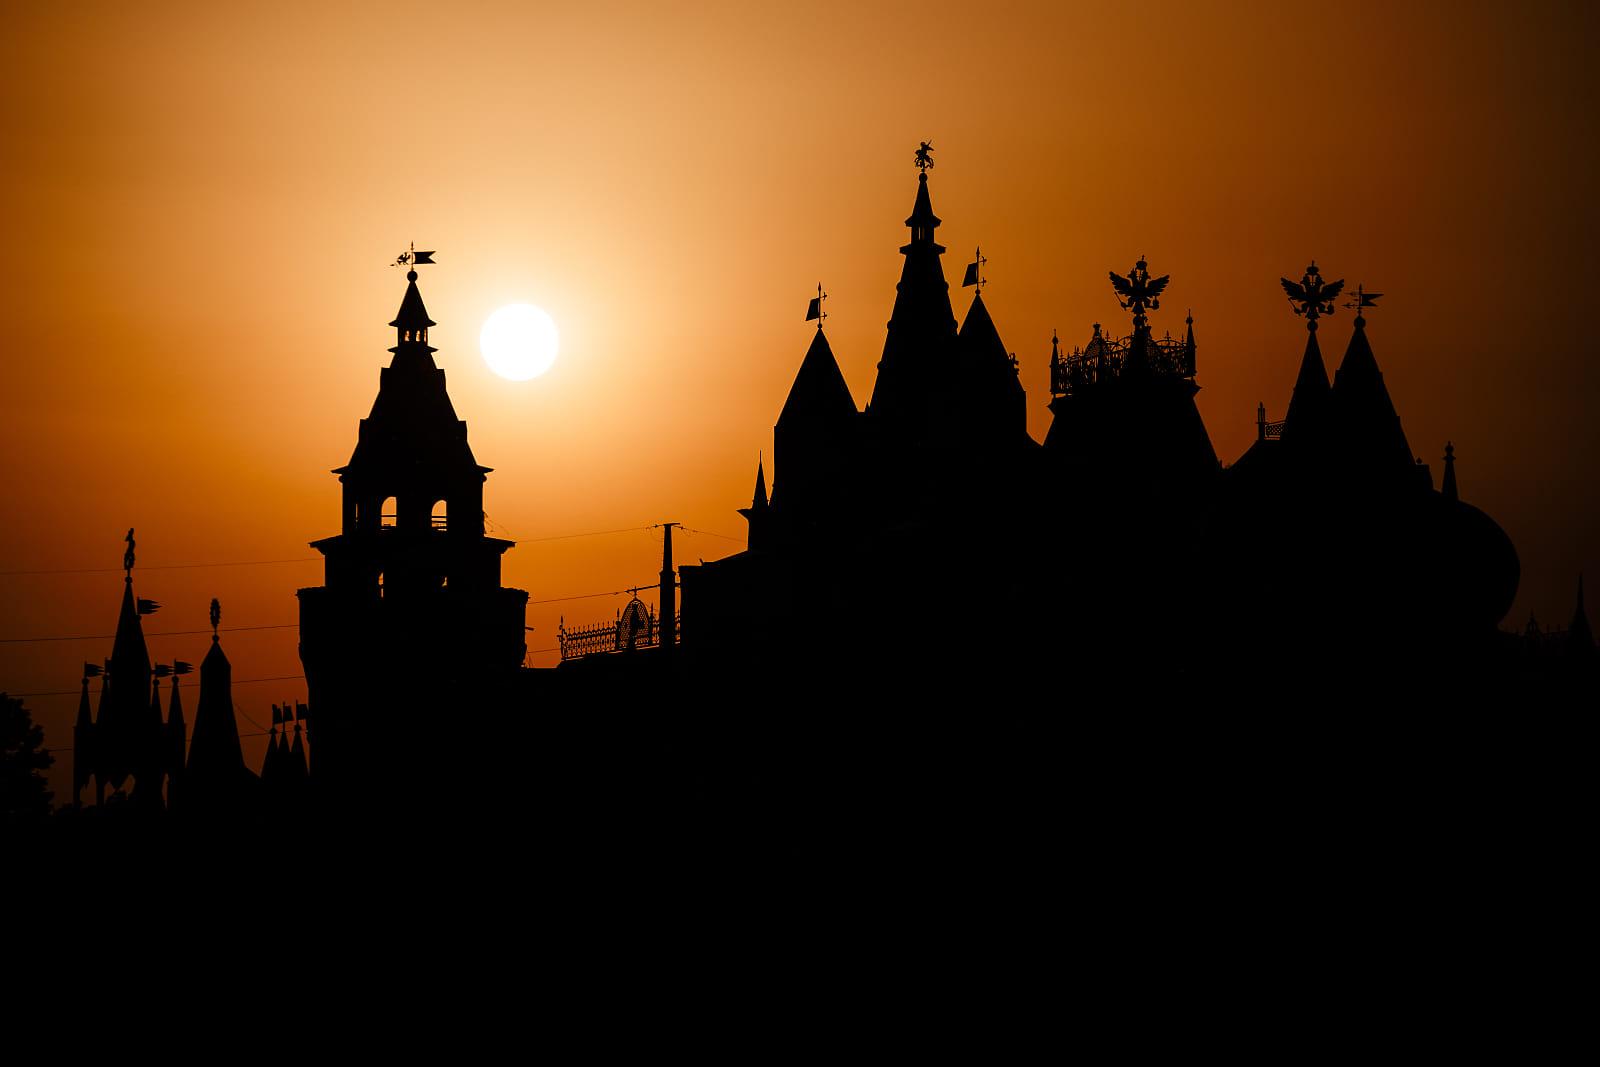 Izmaylovo Kremlin at sunset